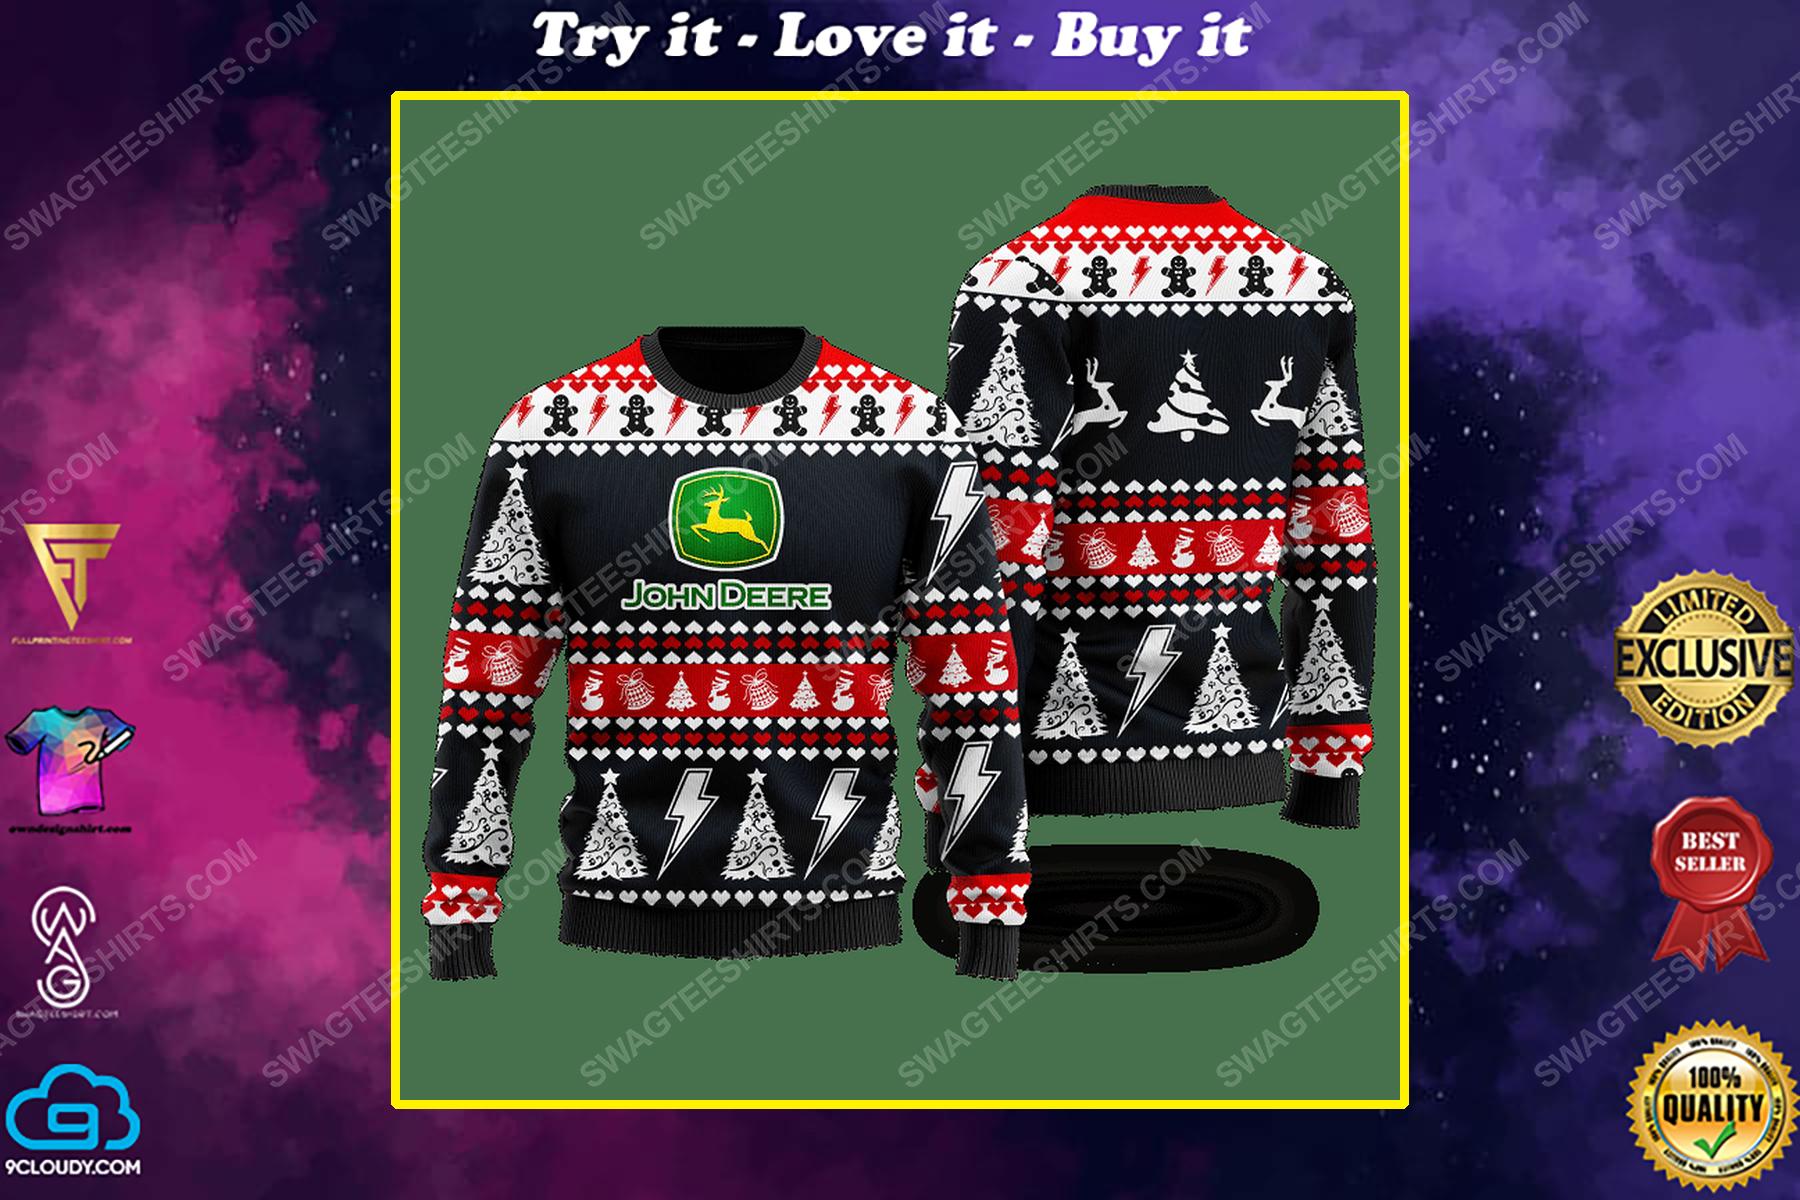 John deere company ugly christmas sweater 1